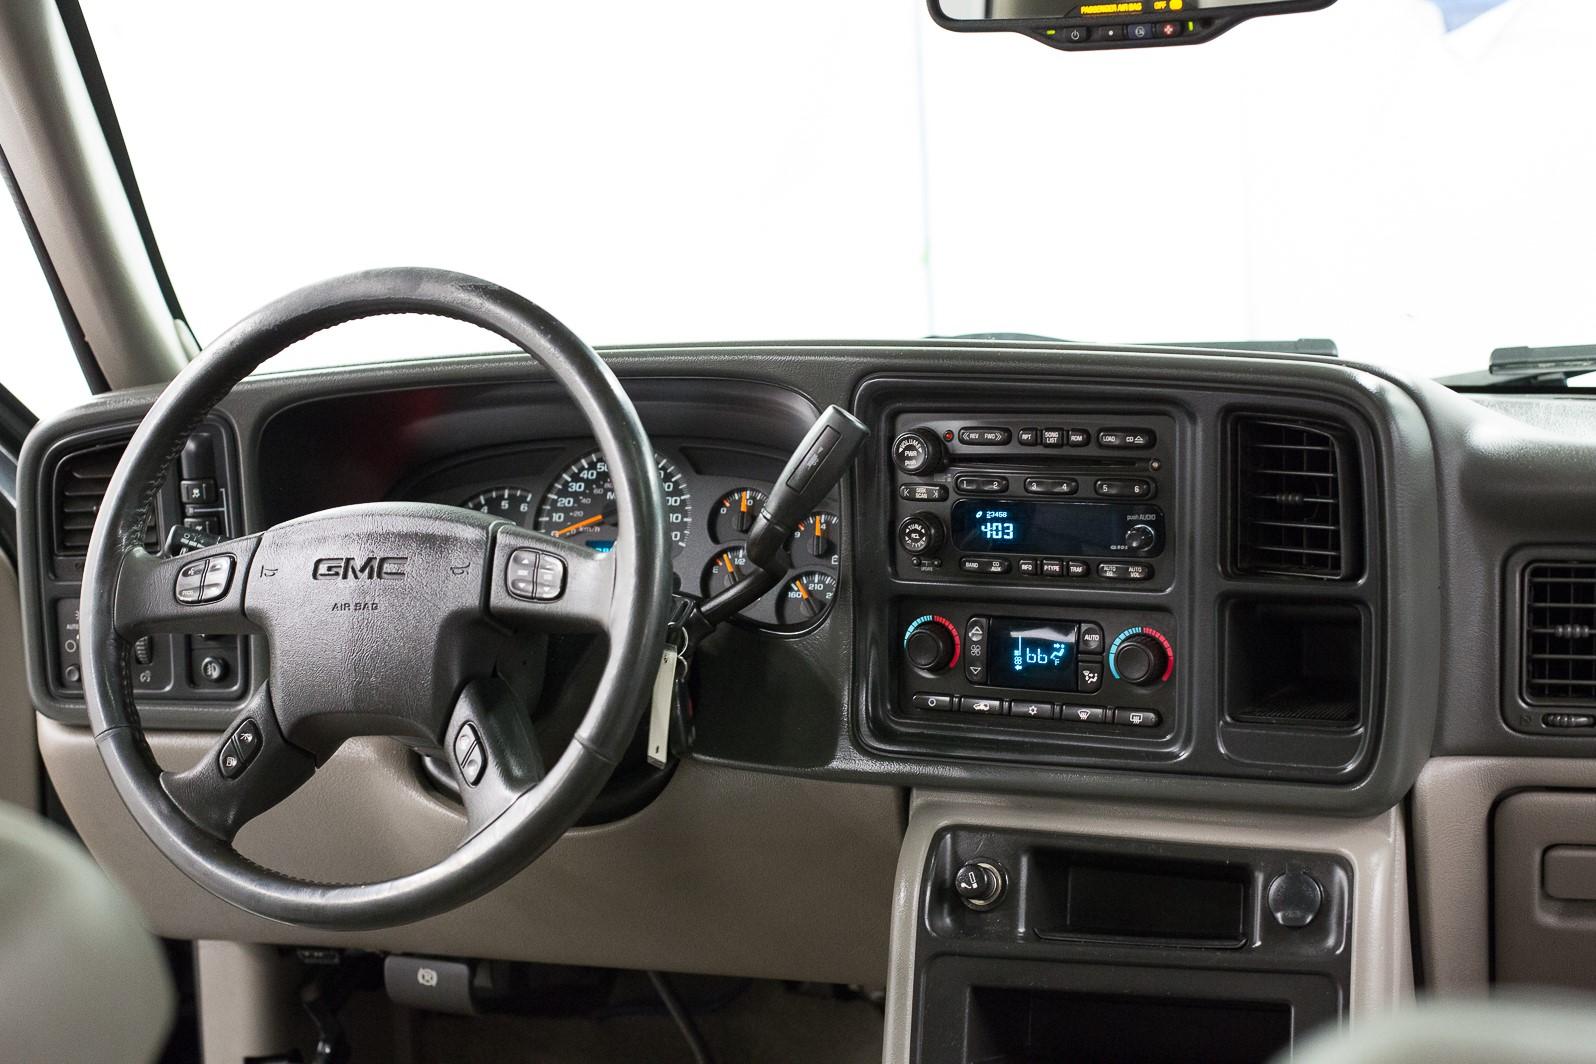 2004 GMC Yukon SLT full